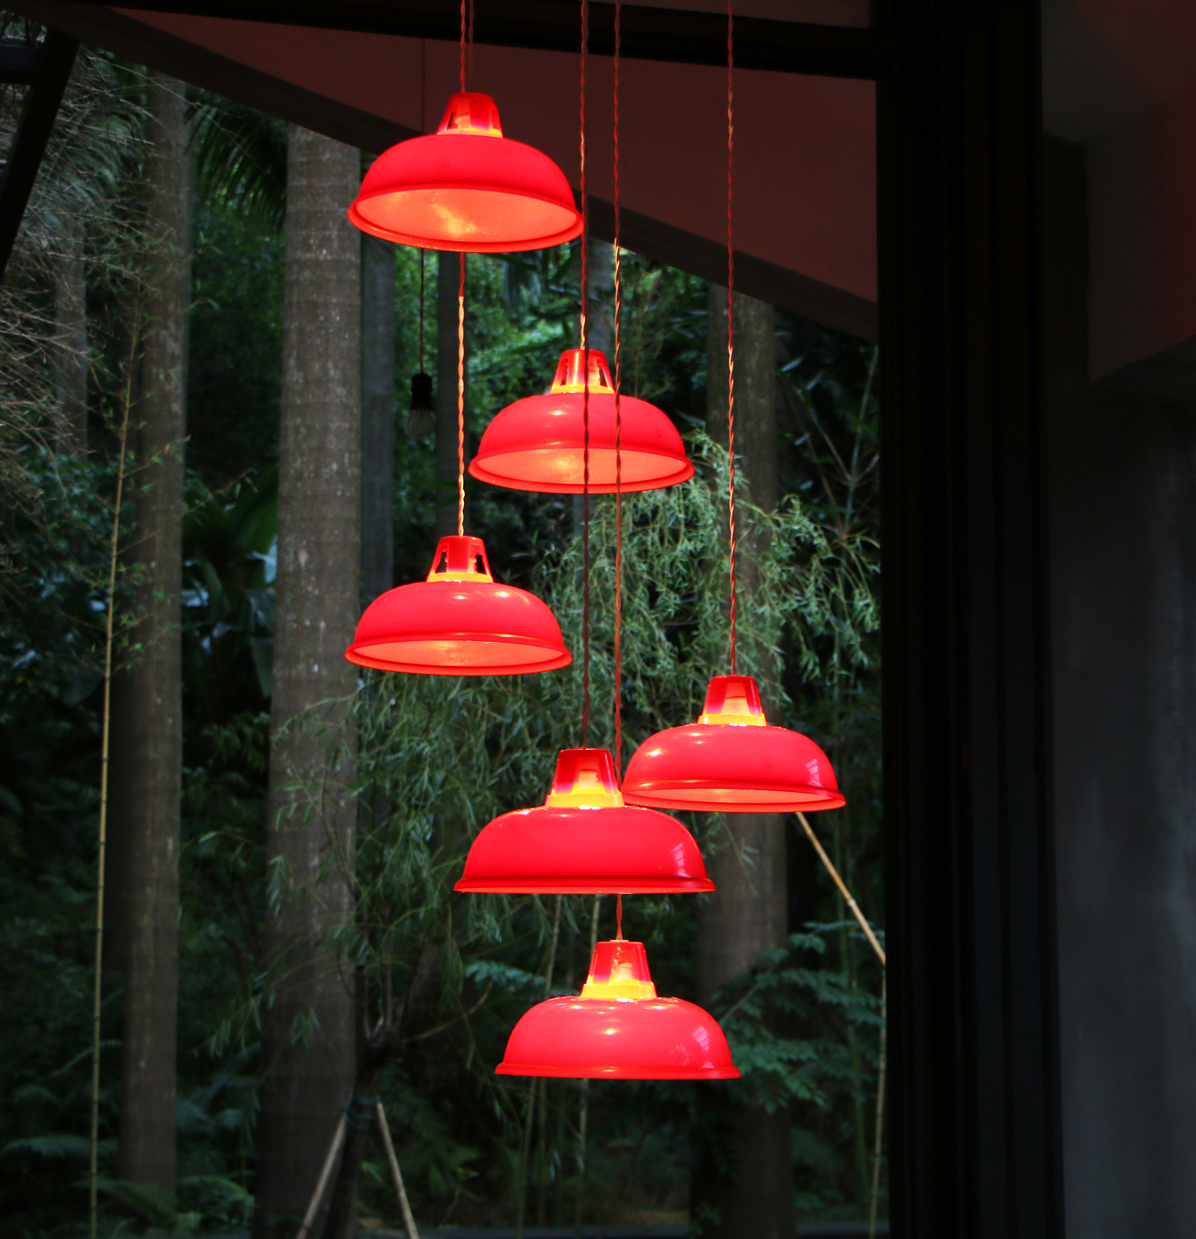 Jun Yang,  Lamp House  ©️ Authors, the shop, 2019